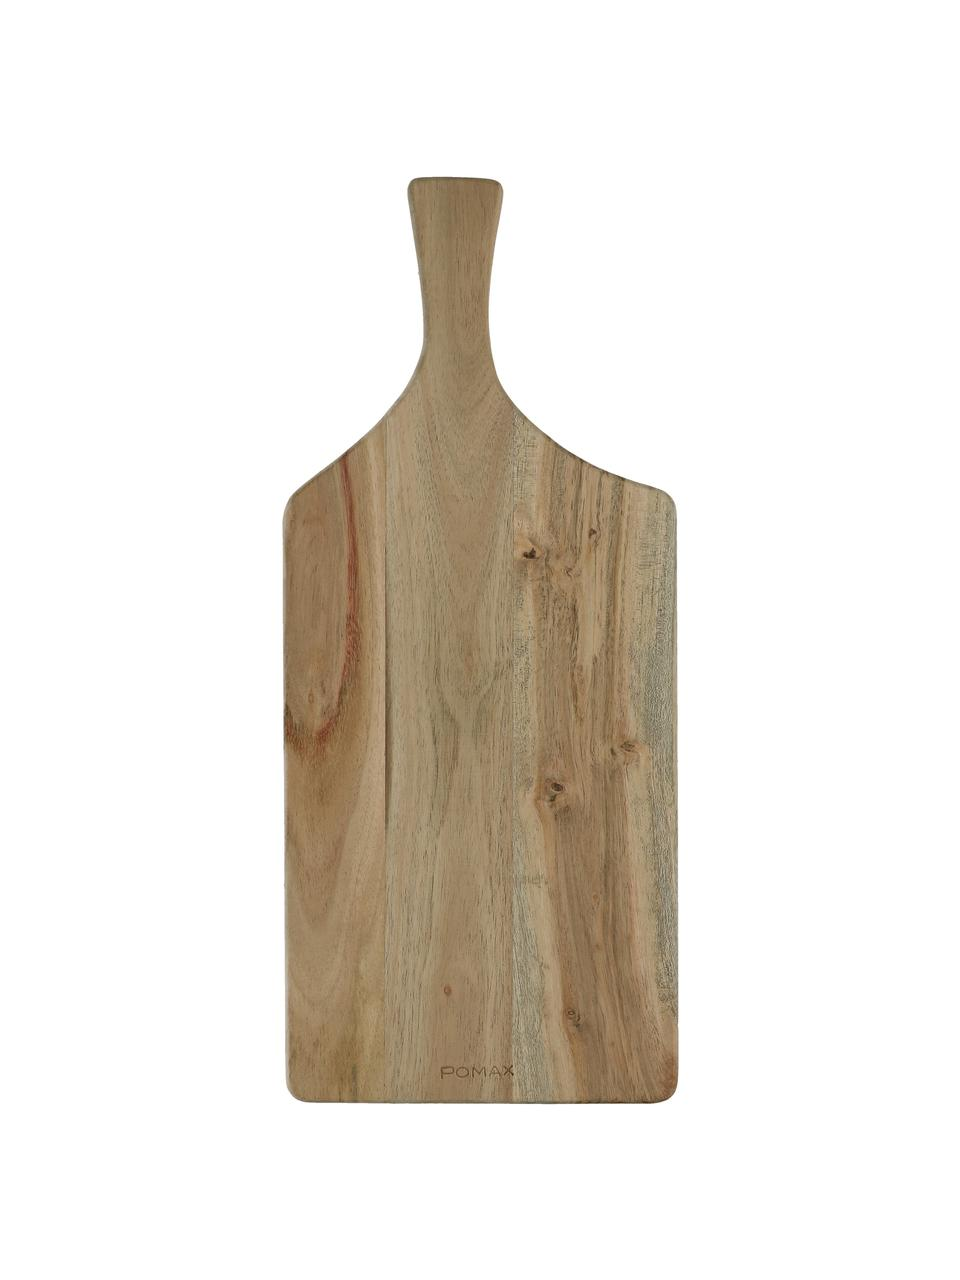 Acaciahouten snijplank Limitless, L 50 x B 22 cm, Acaciahout, Acaciahout, 22 x 50 cm